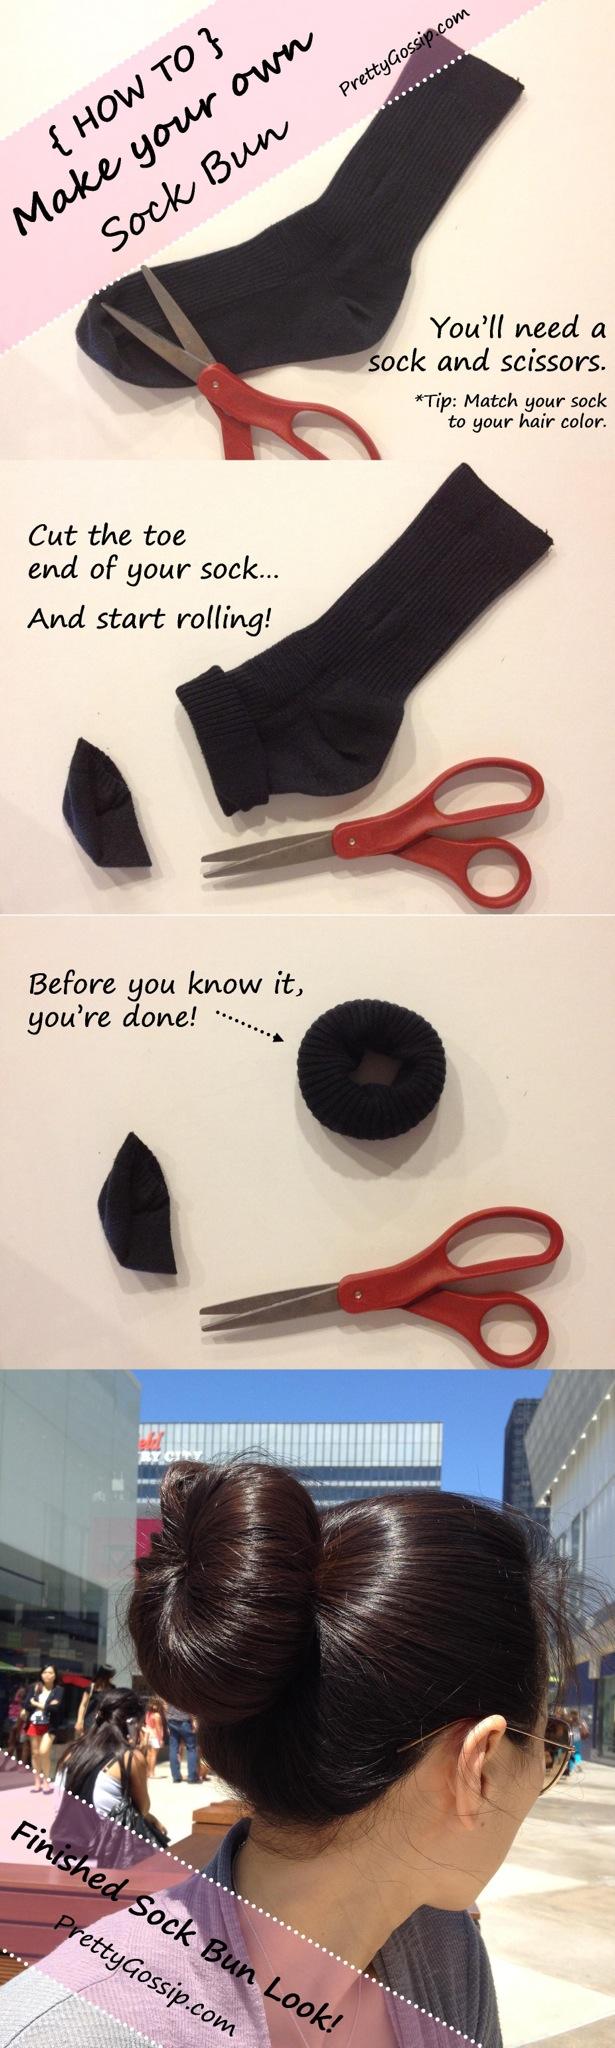 How To Make A Sock Bun Diy Donut Bun Hairstyles Hair Donut Hair Bun Maker